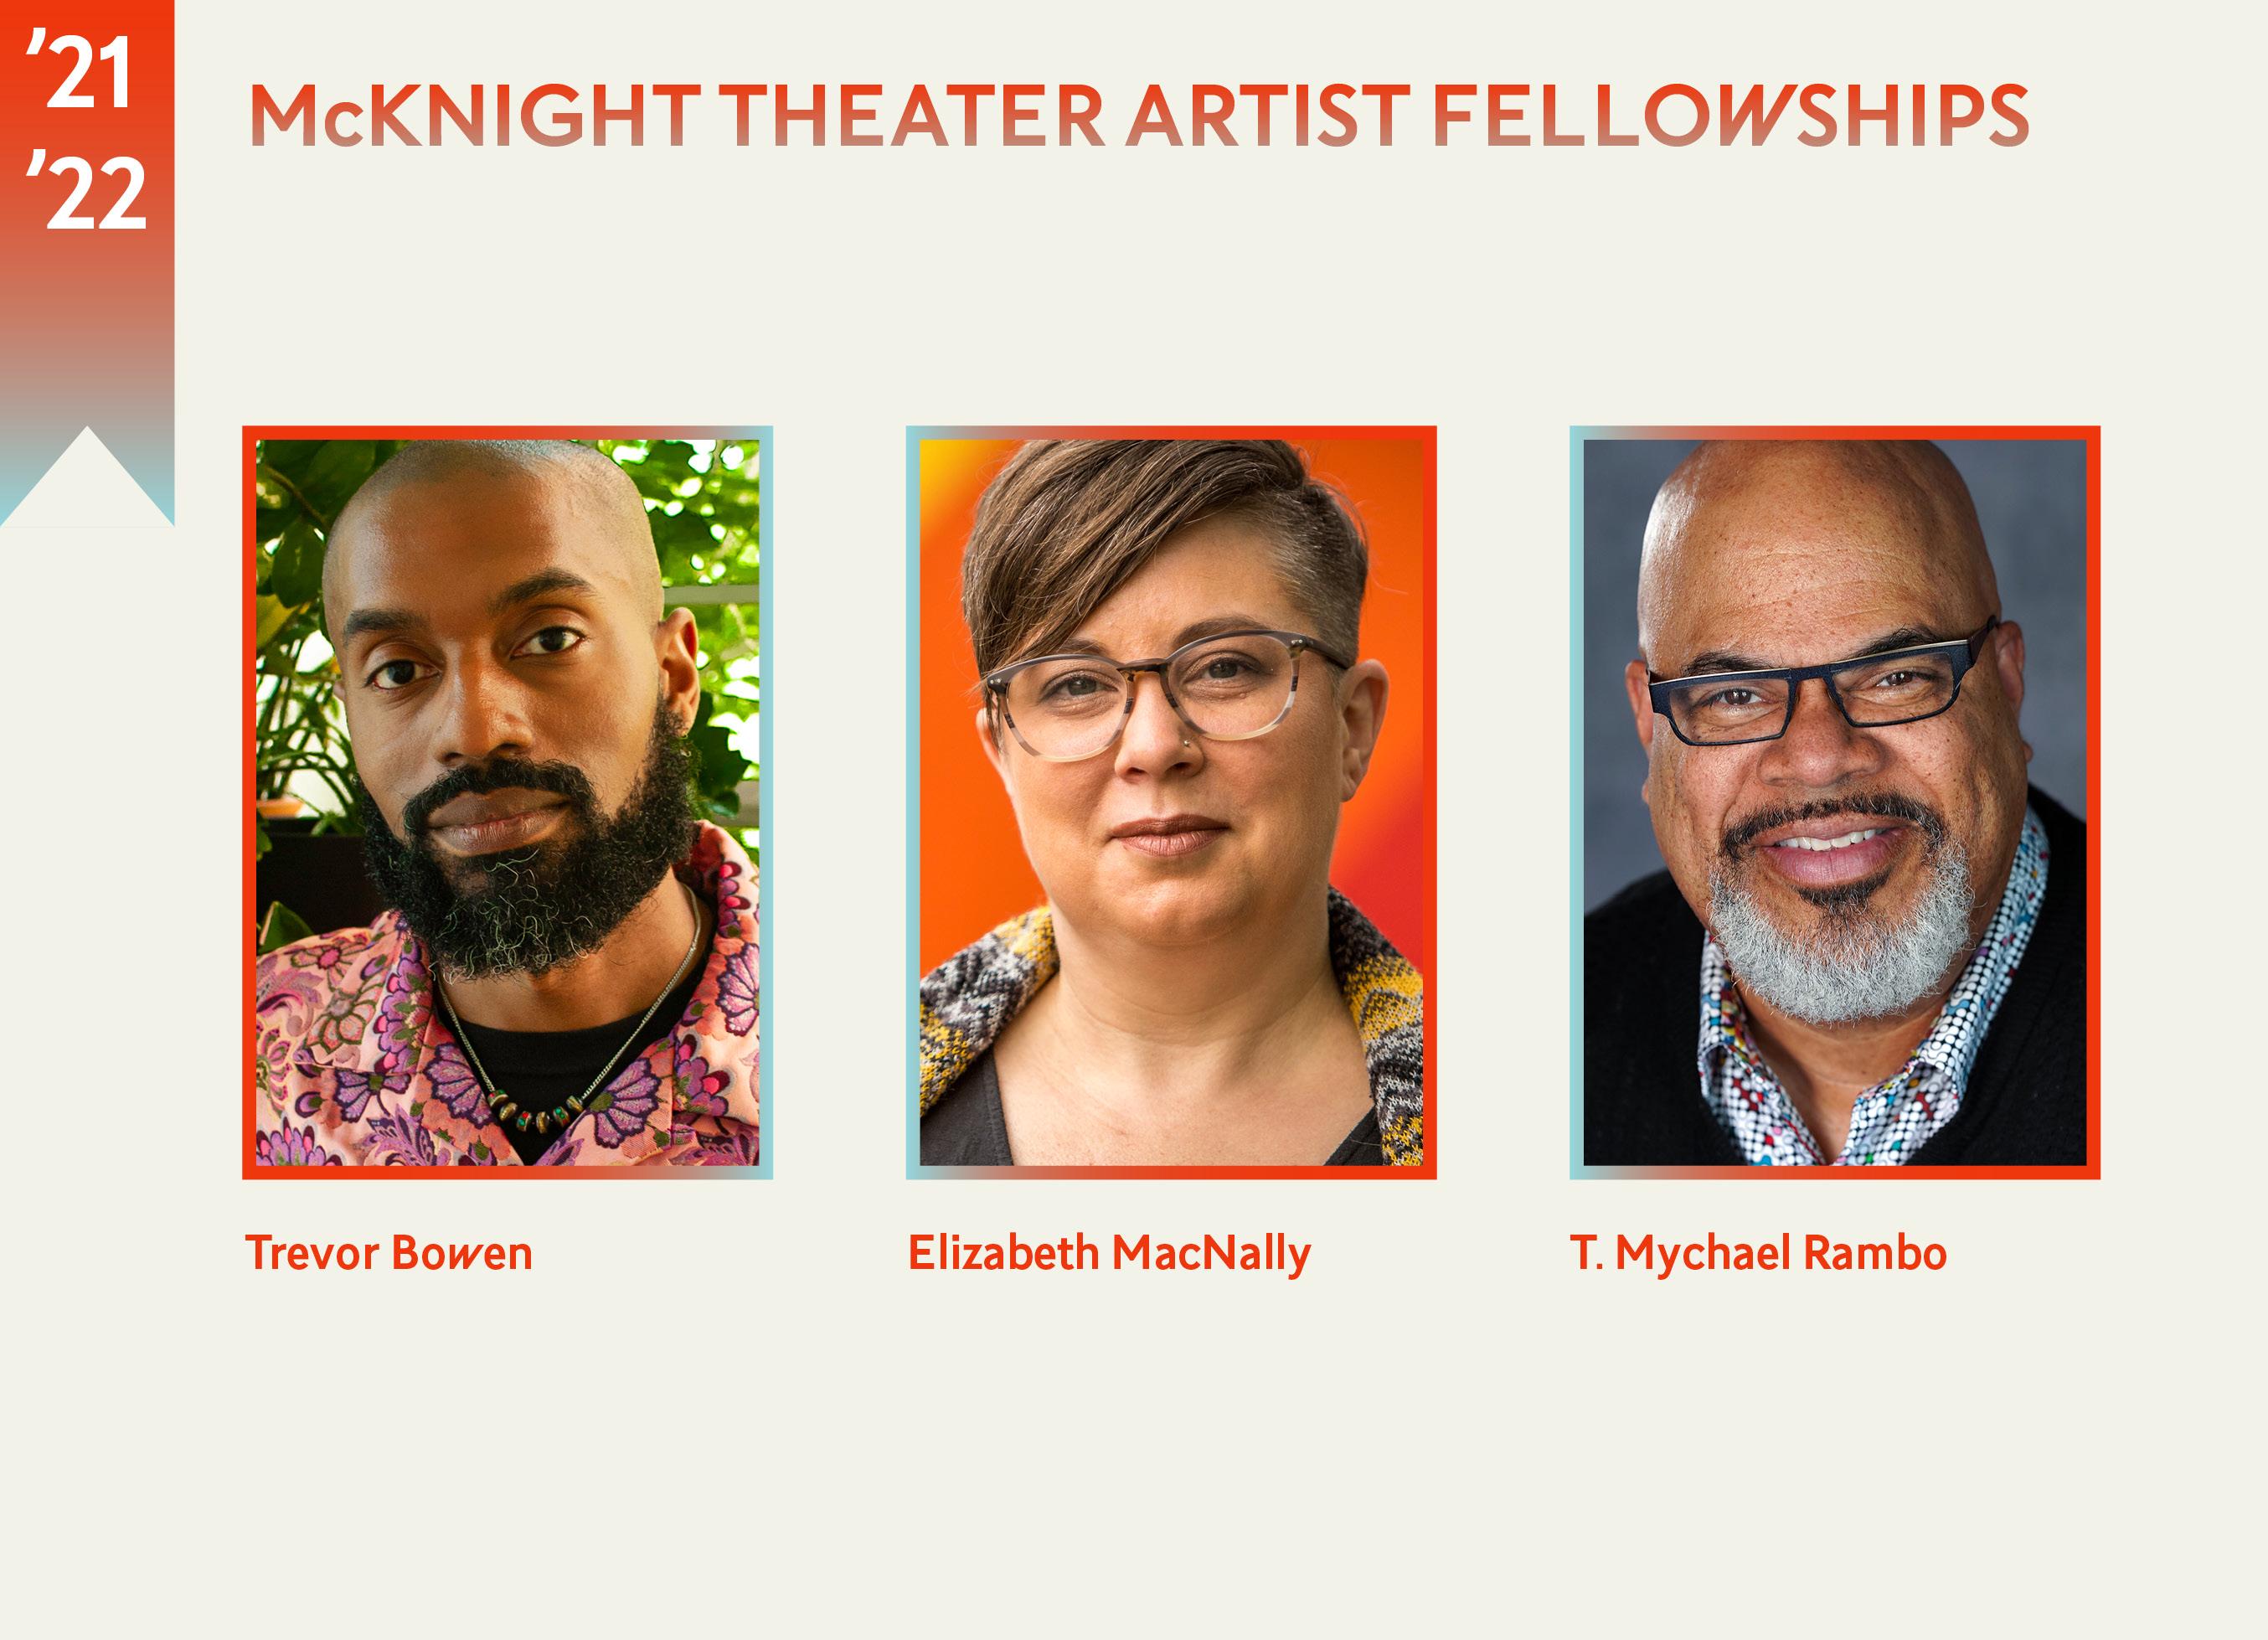 The headshots ofthe 2021-2022 McKnight Theater Artist Fellows Trevor Bowen, Elizabeth MacNally, and T. Mychael Rambo